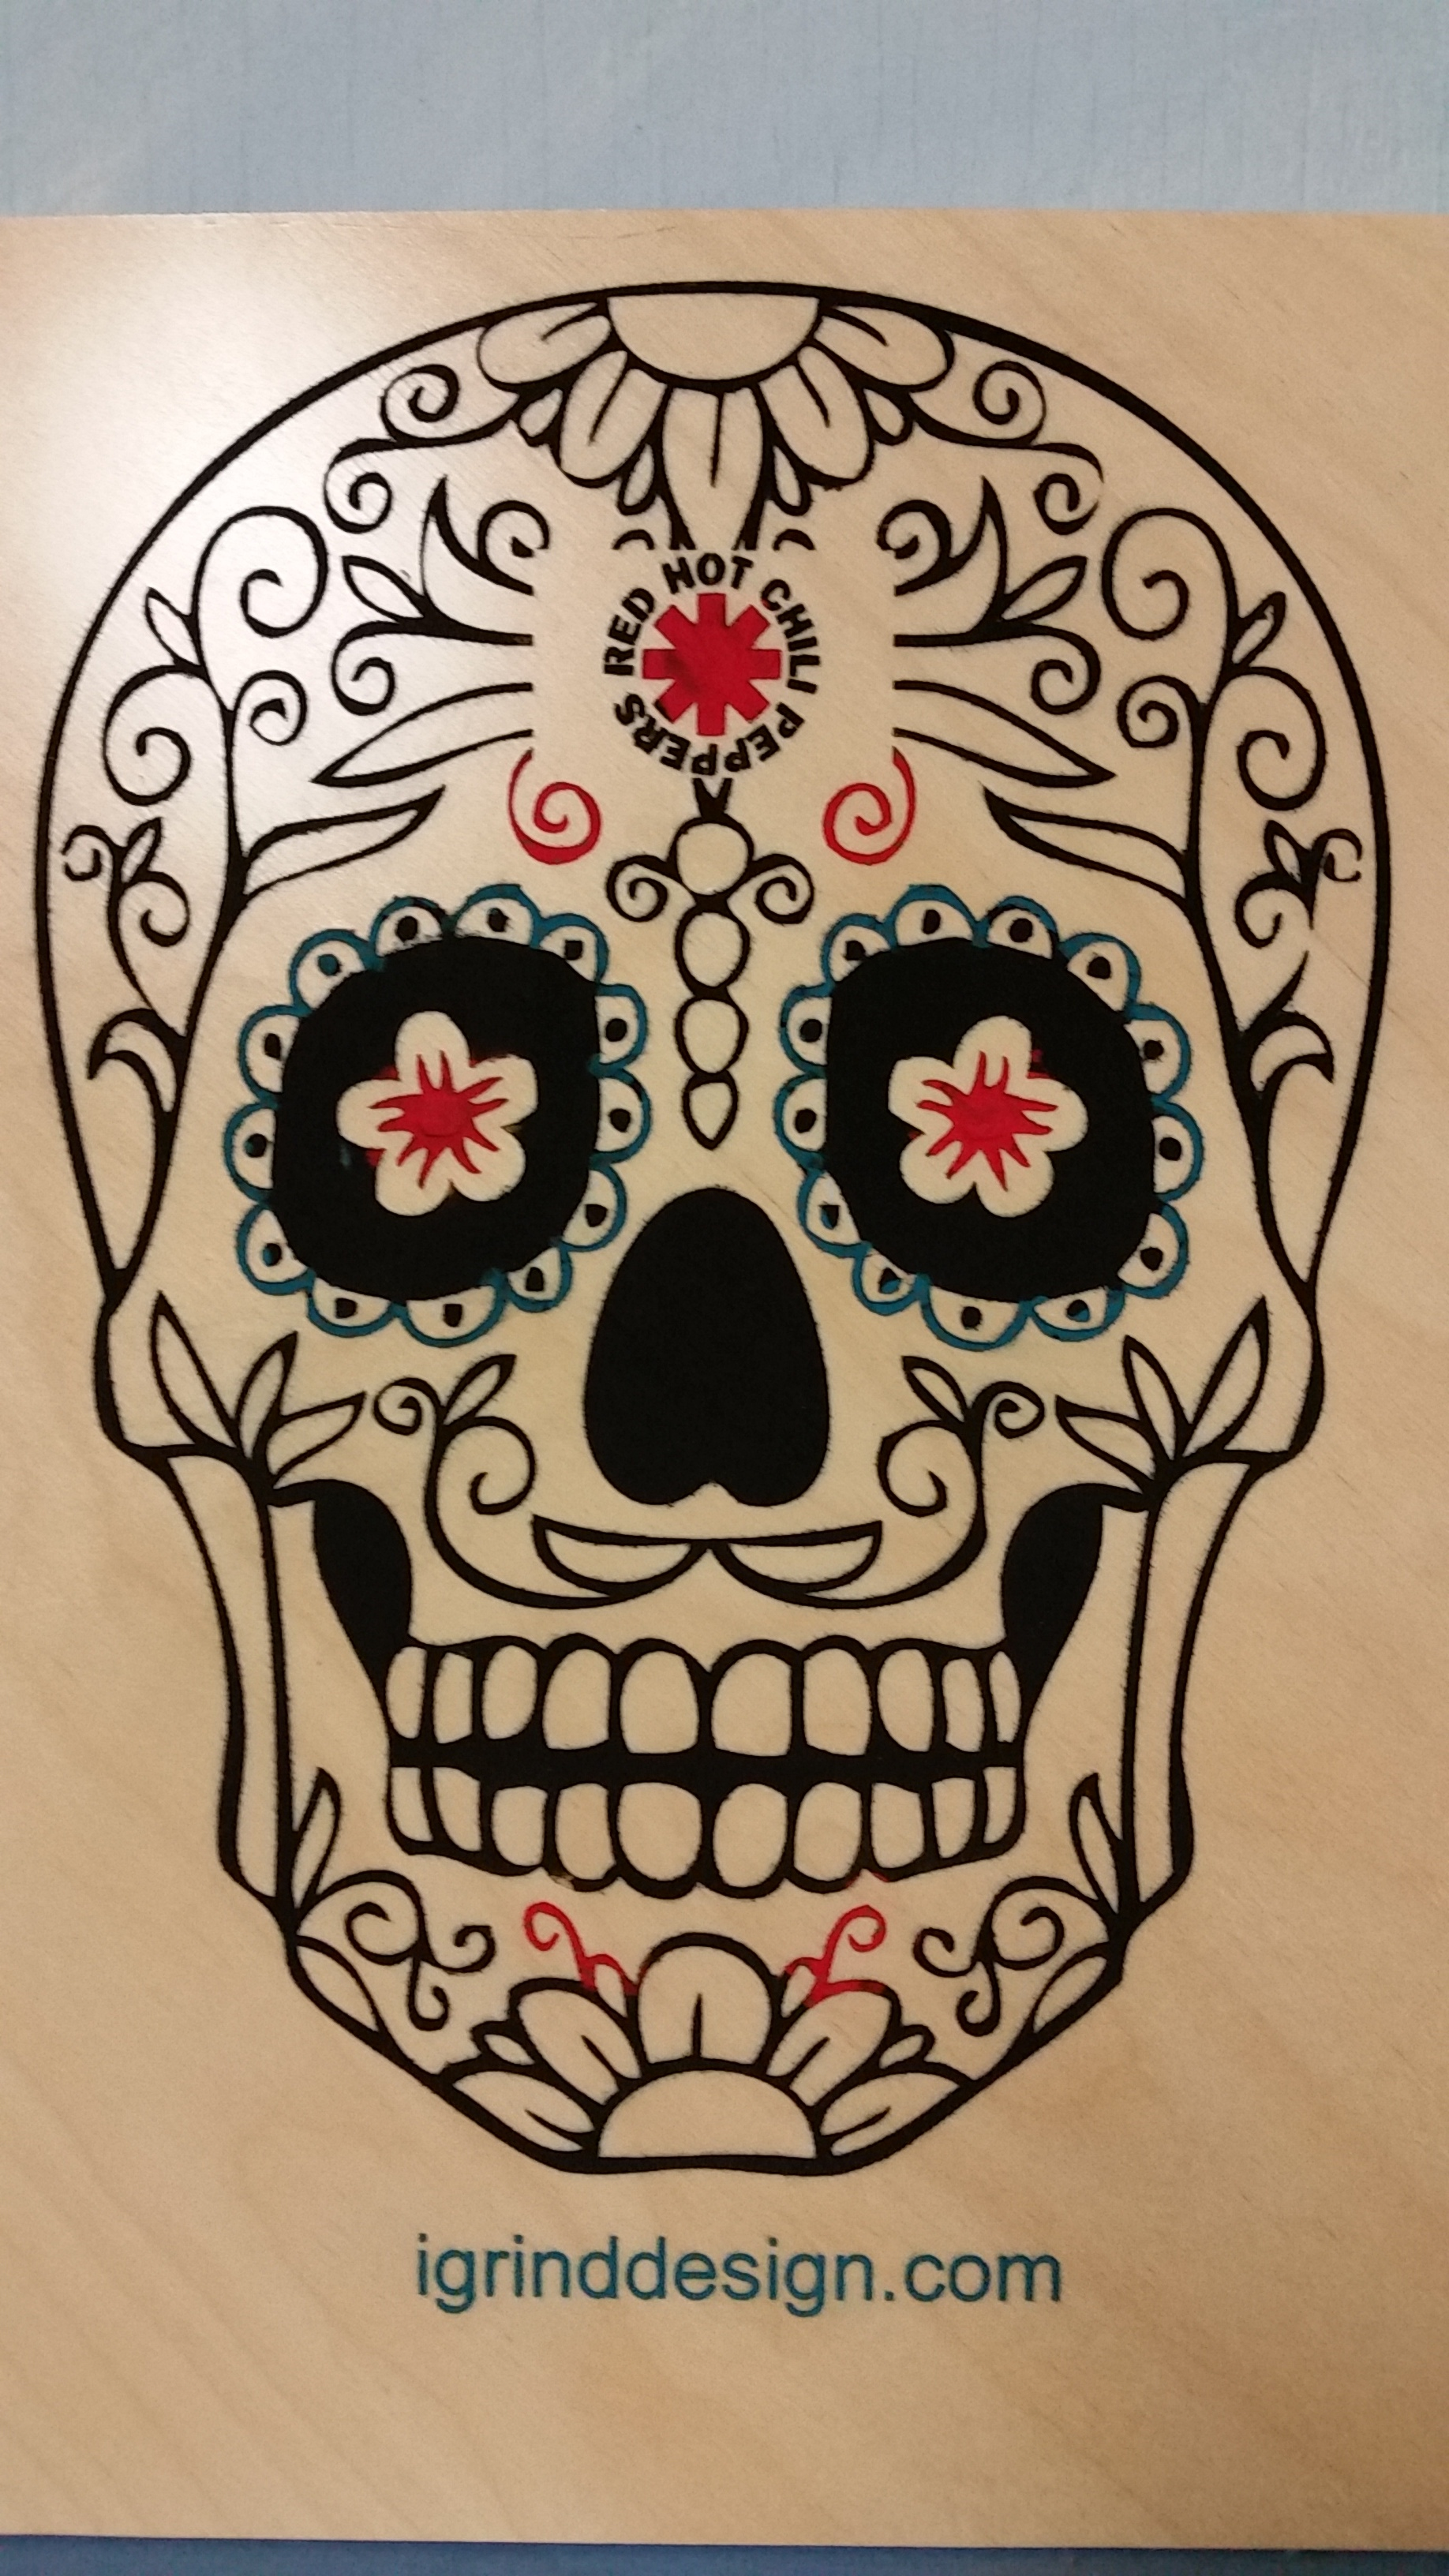 woodfinshed-skull.jpg